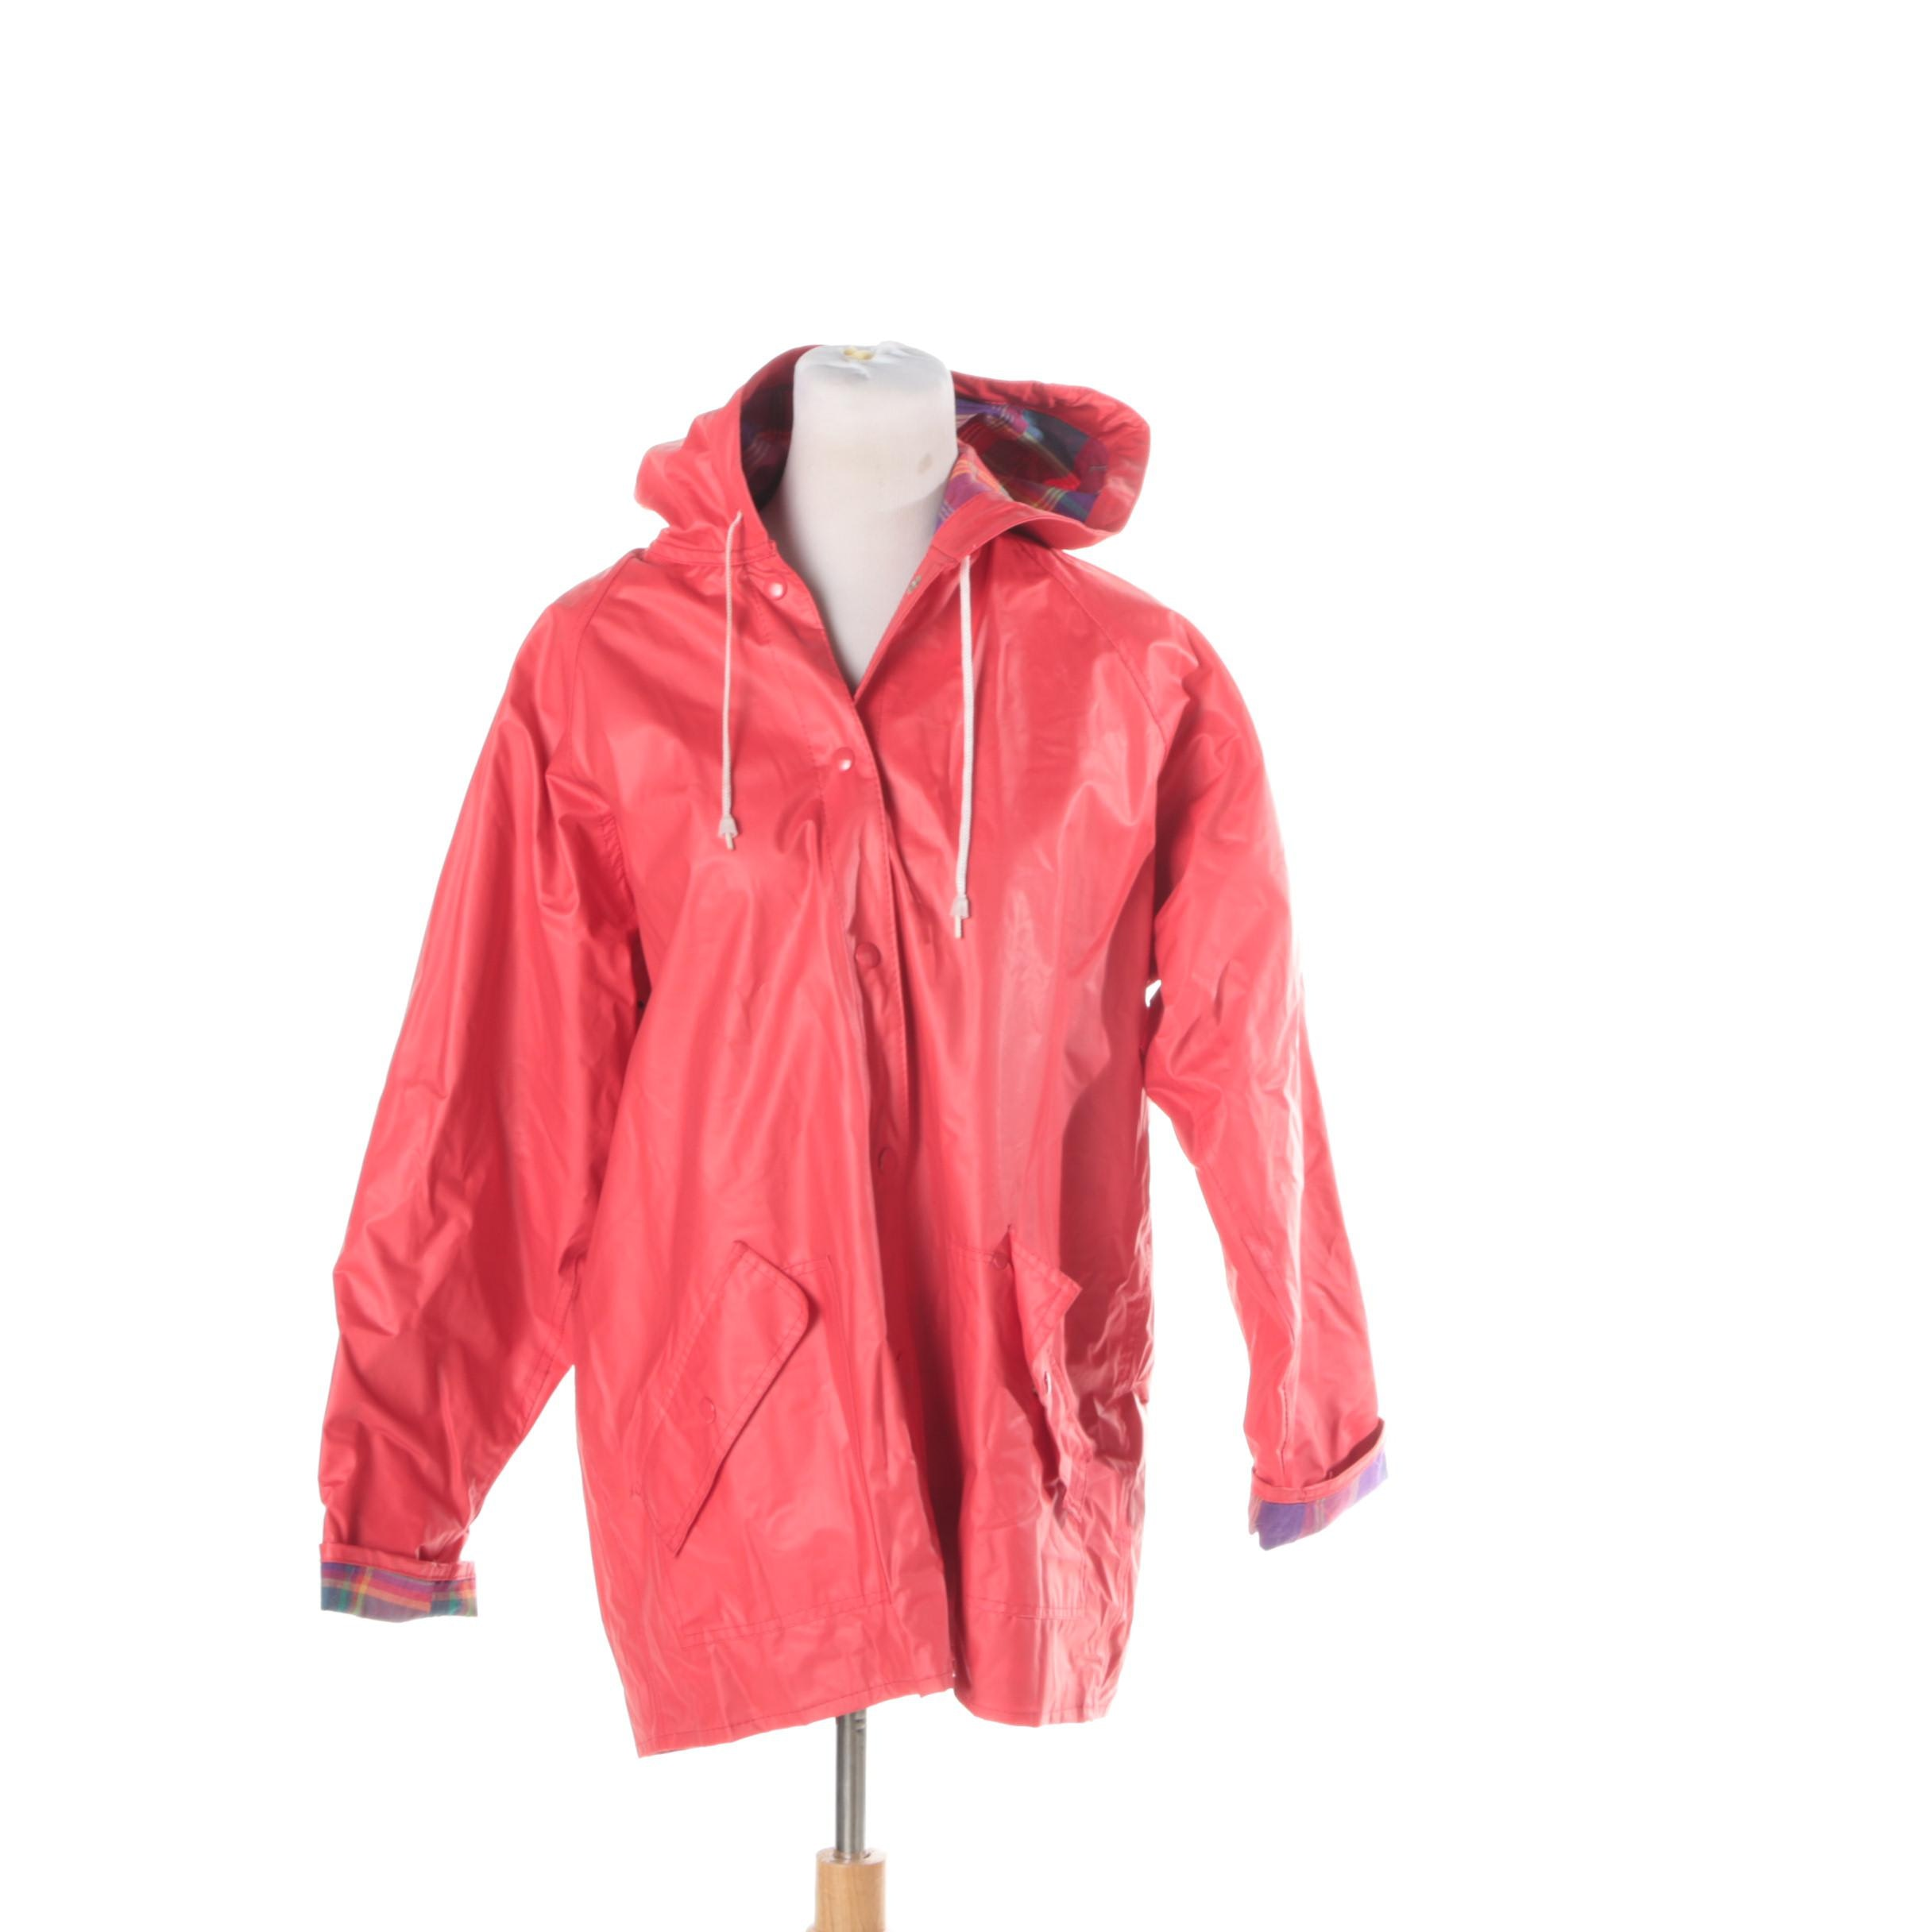 Talbots Raincoat with Plaid Cotton Lining